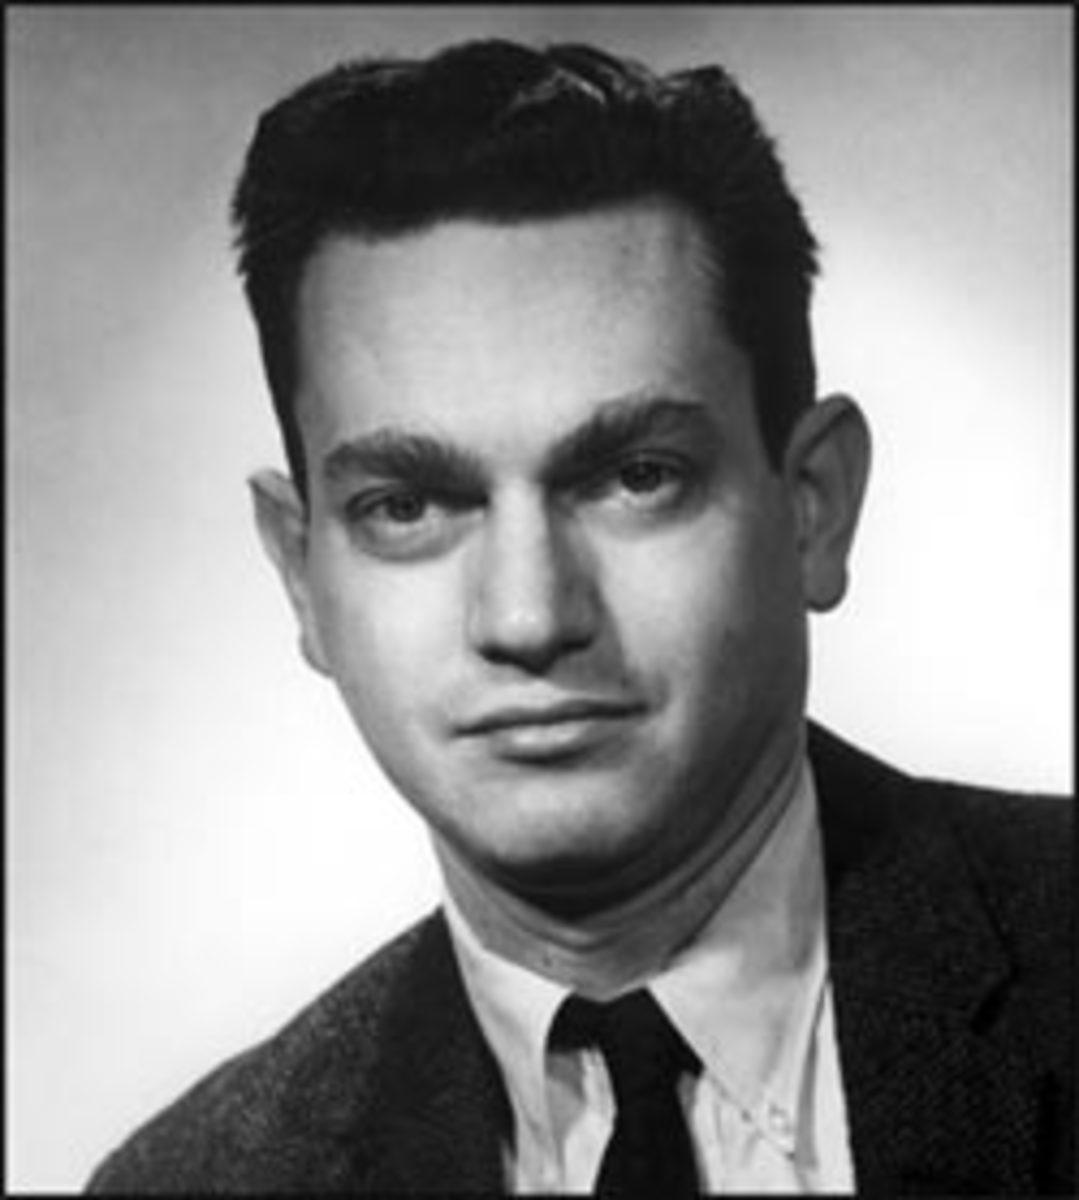 Marshall Warren Nirenberg (April 10, 1927  January 15, 2010 - cancer deaths